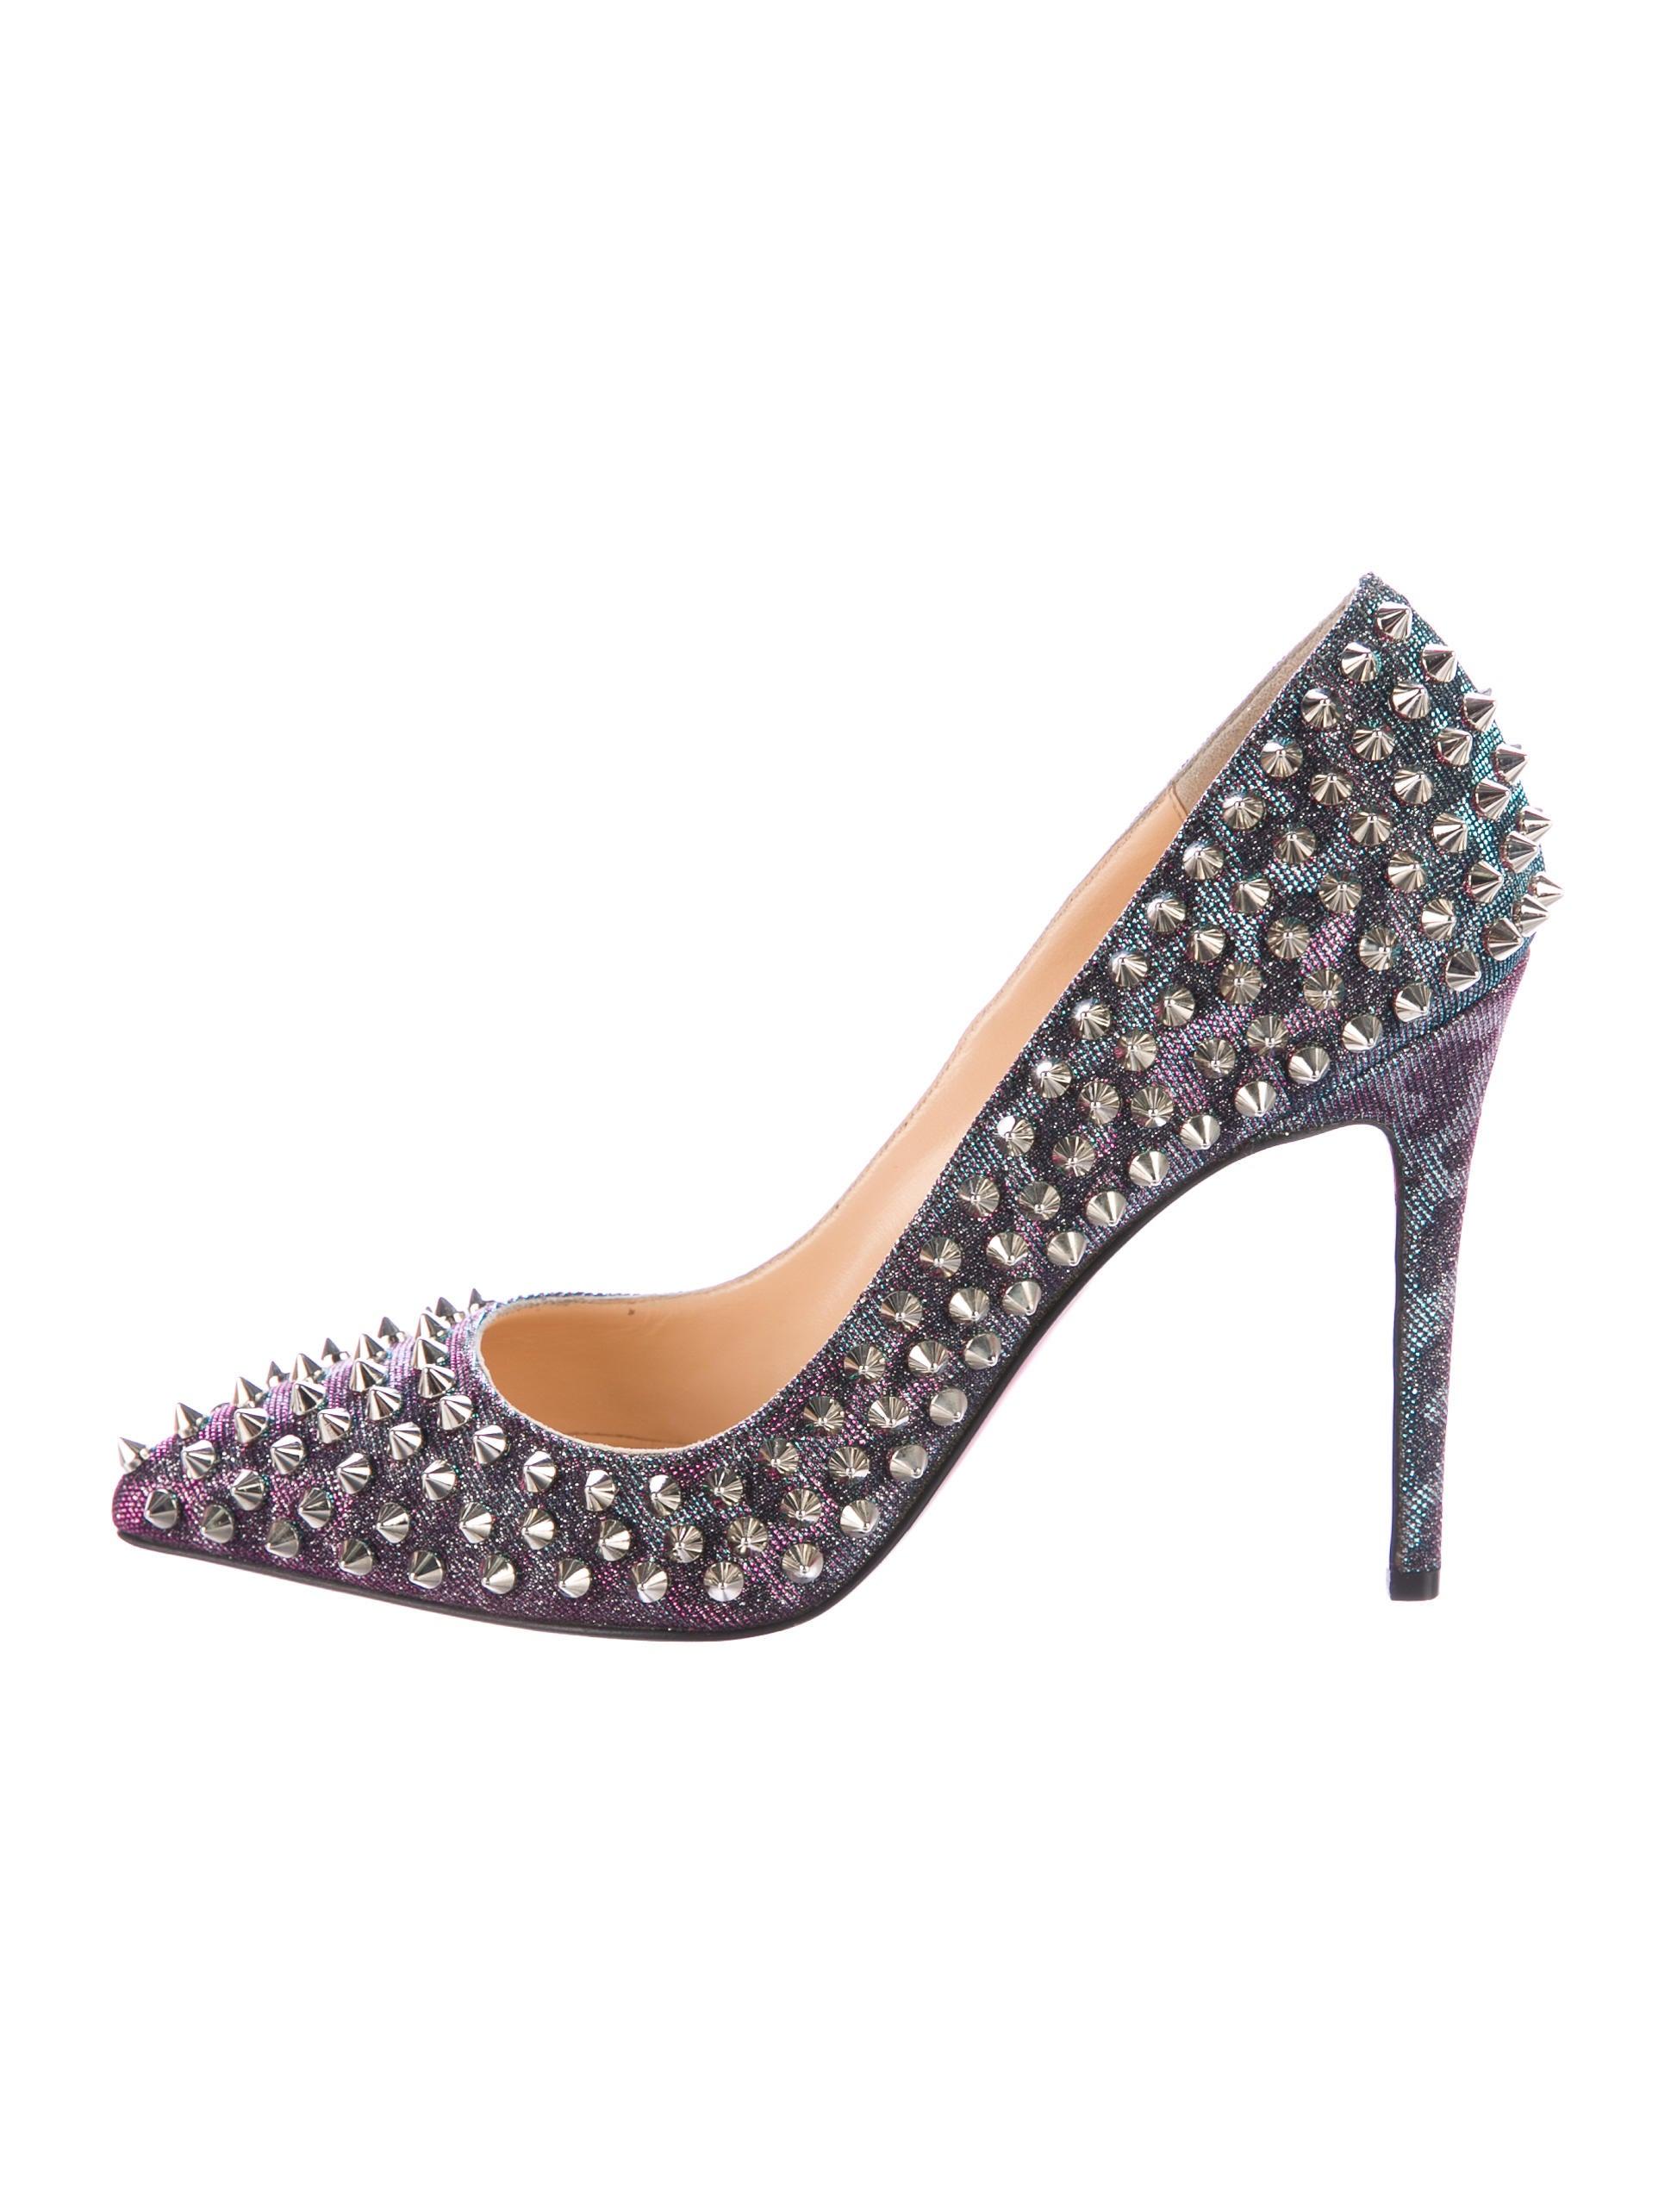 5d465d5aa7c Christian Louboutin Pigalle Glitter Spike Pumps - Shoes - CHT74874 ...